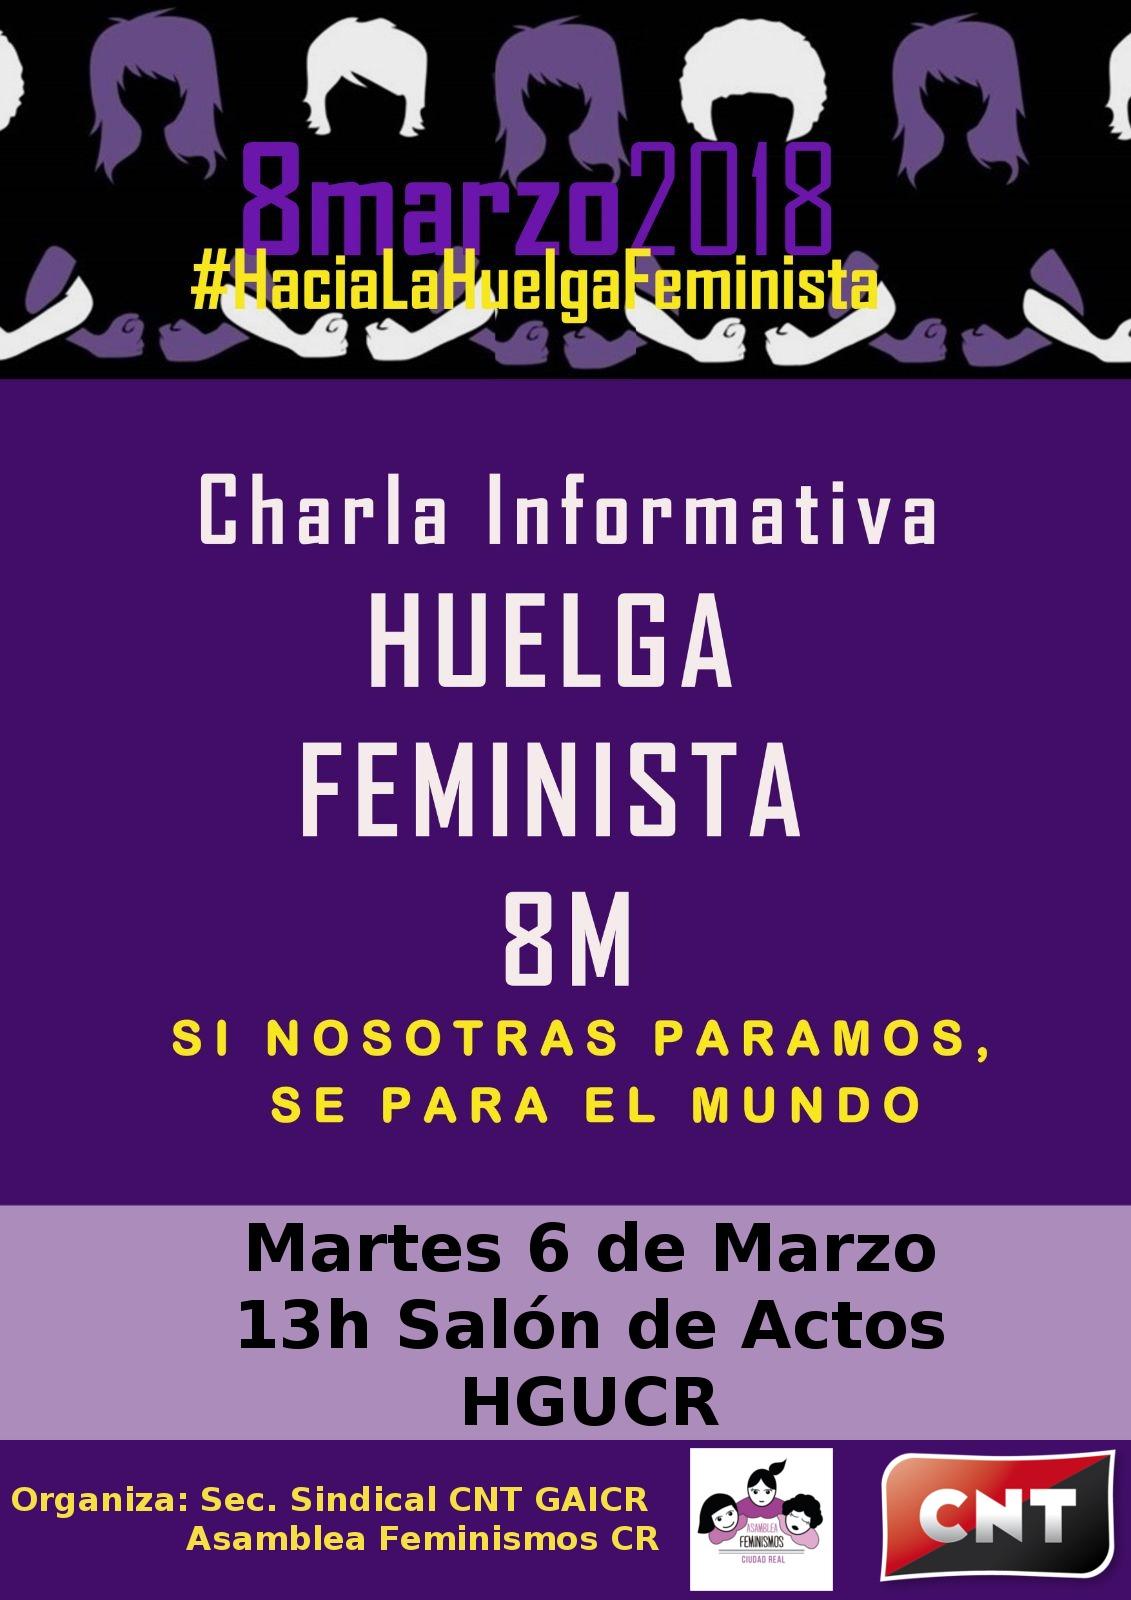 charla informativa huelga feminista